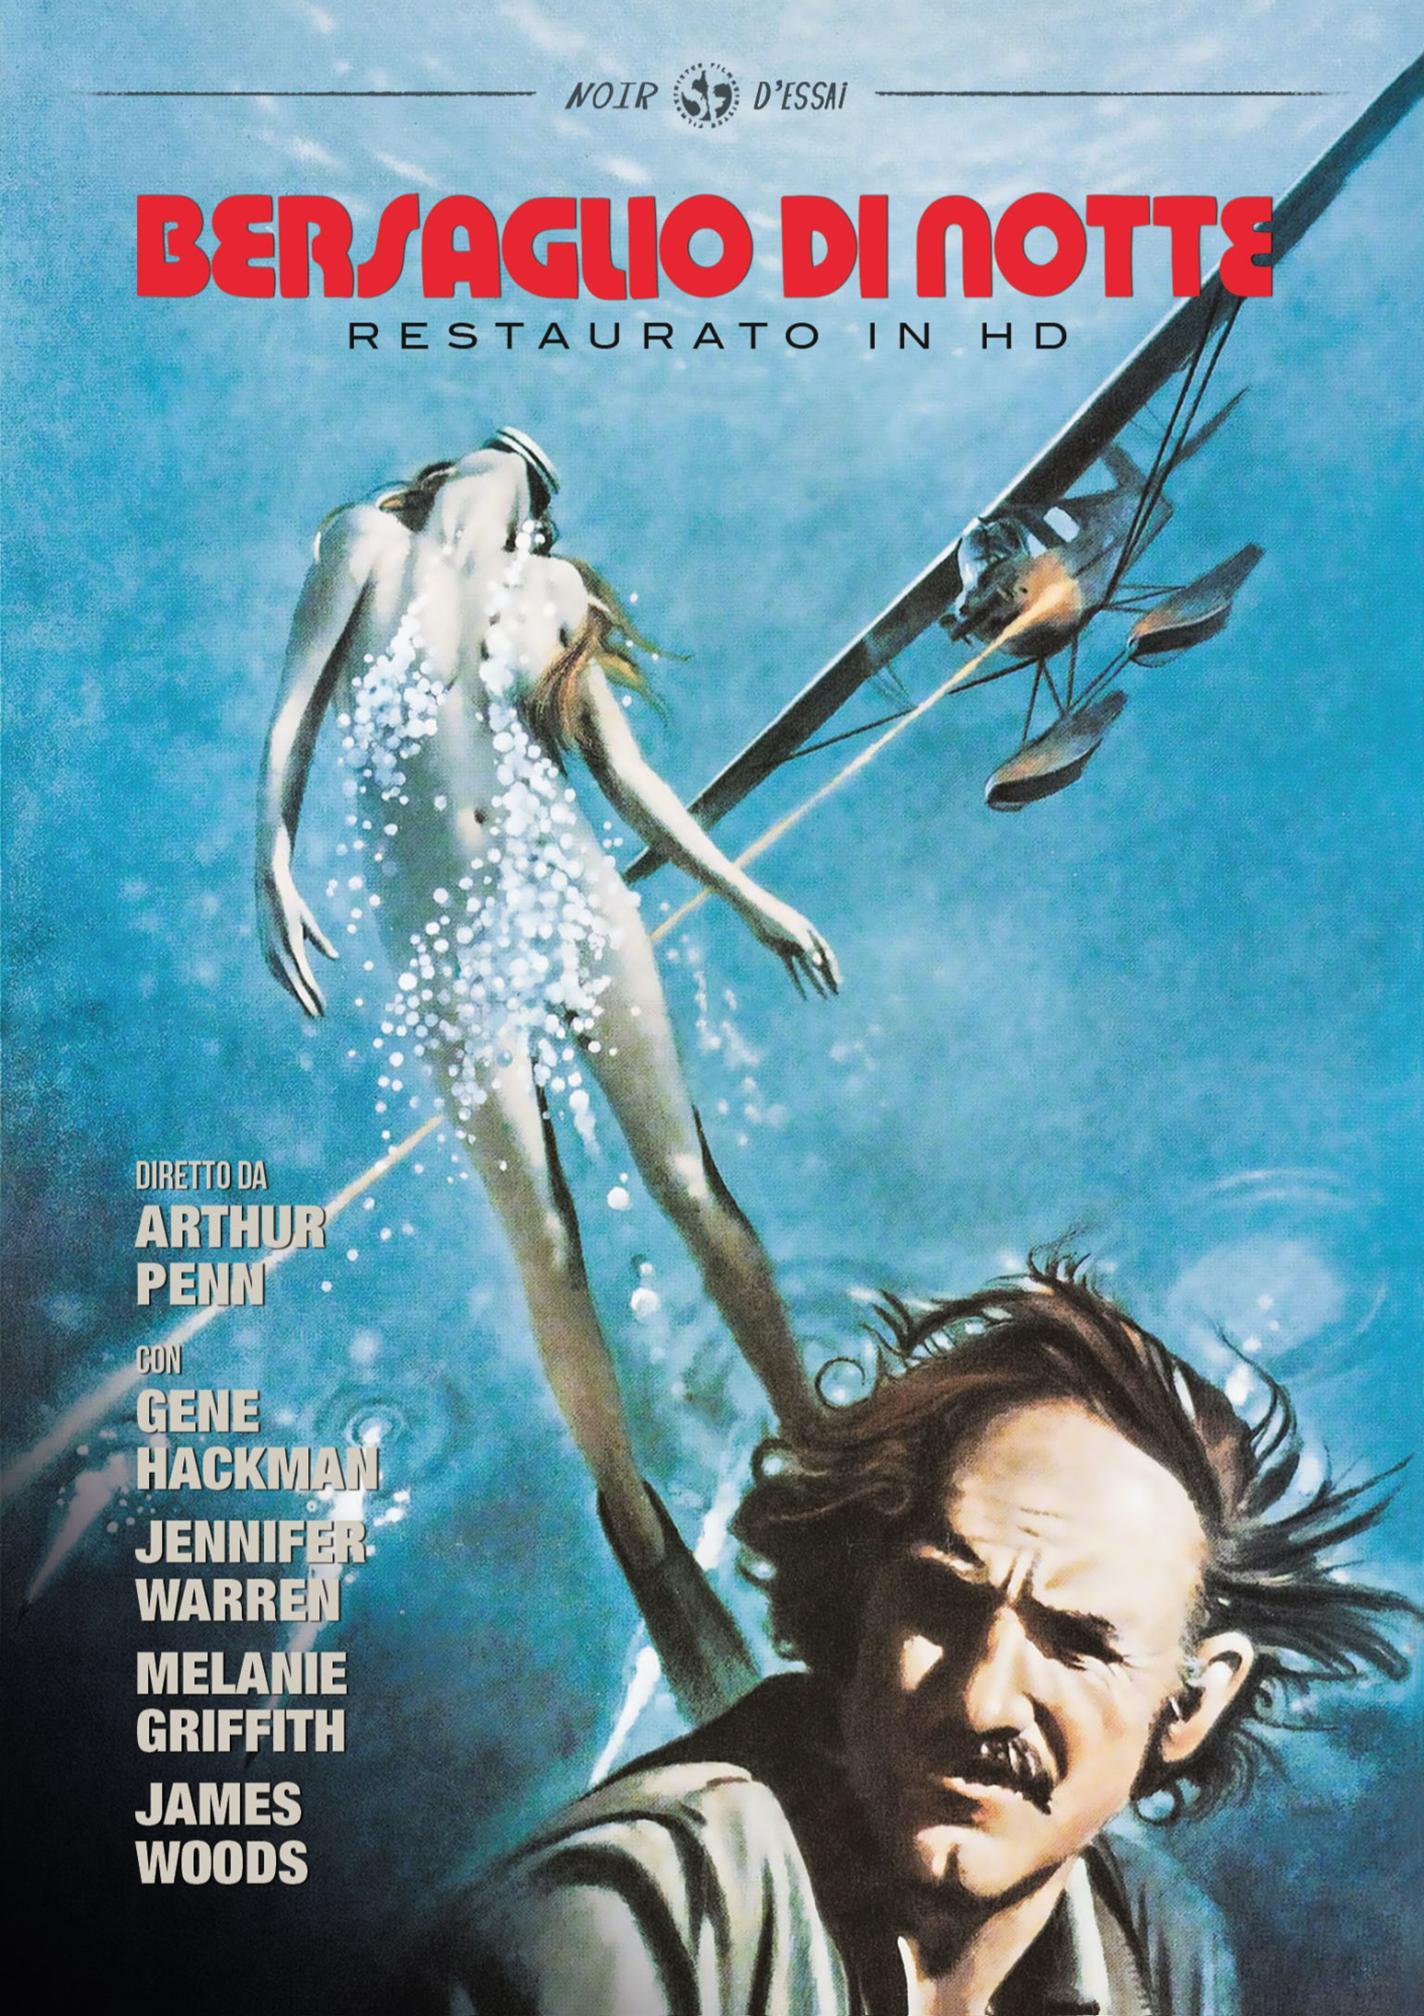 BERSAGLIO DI NOTTE (RESTAURATO IN HD) (DVD)